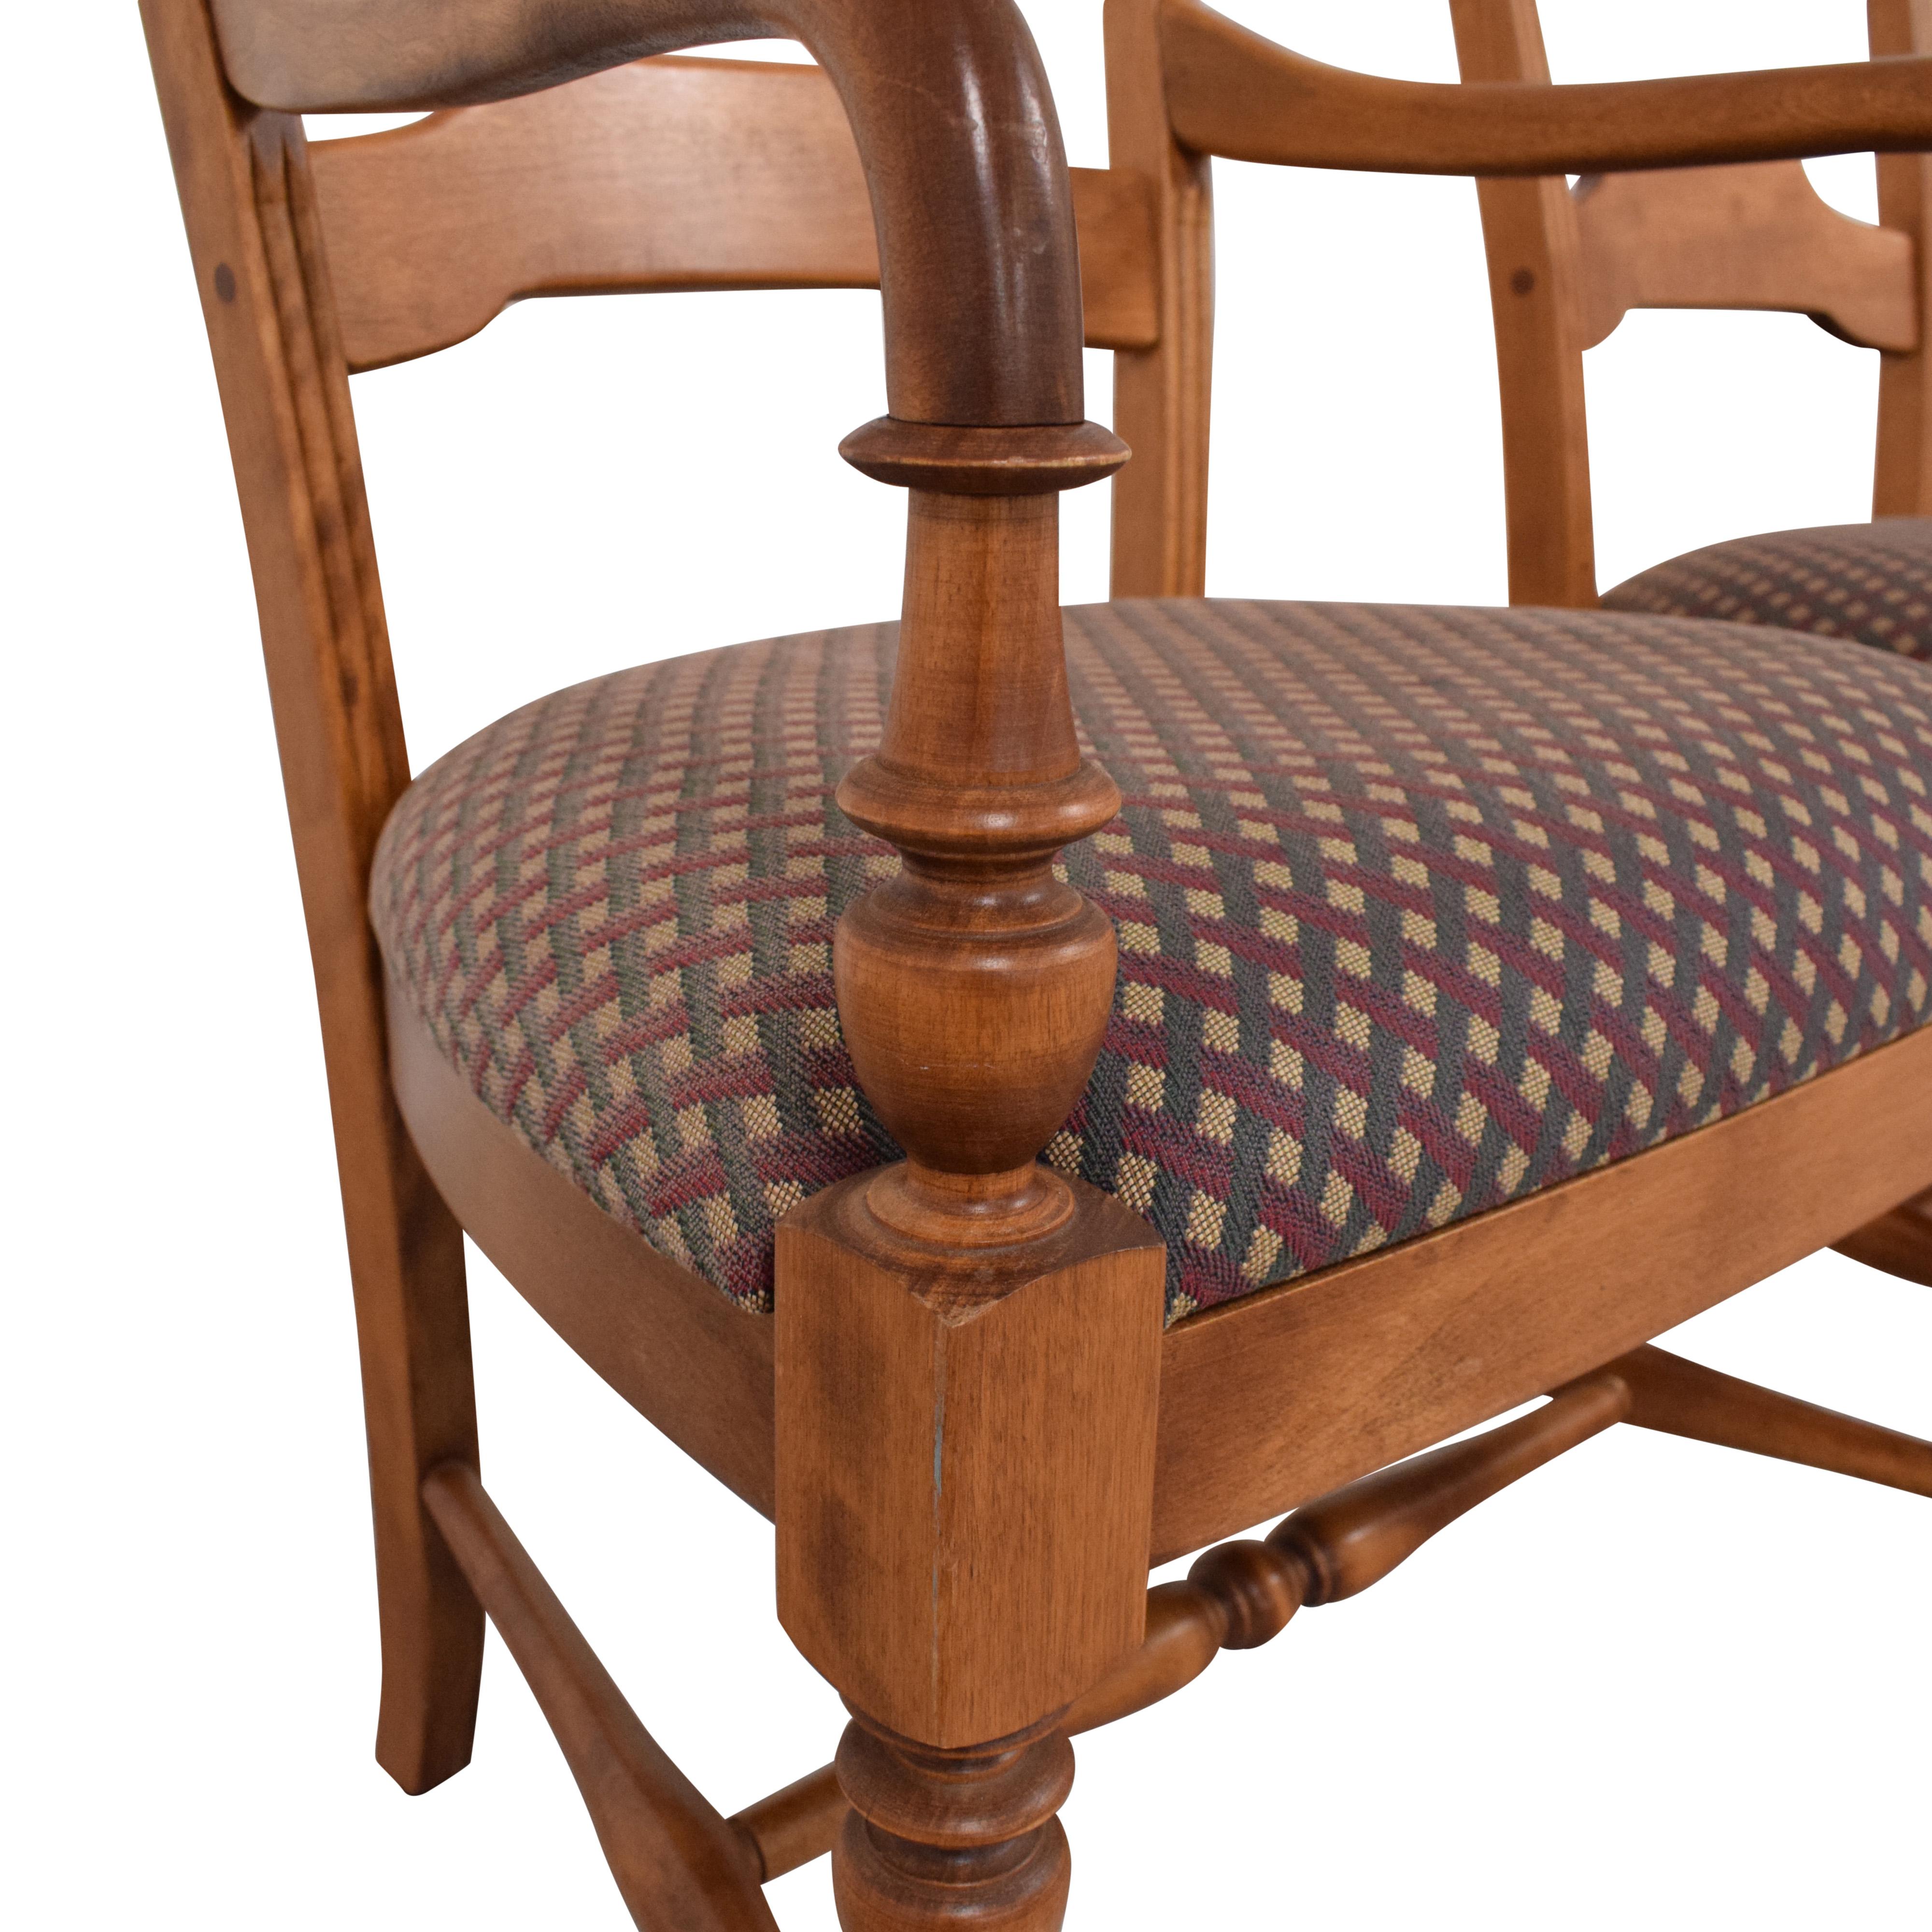 Nichols & Stone Nichols & Stone Dining Chairs used